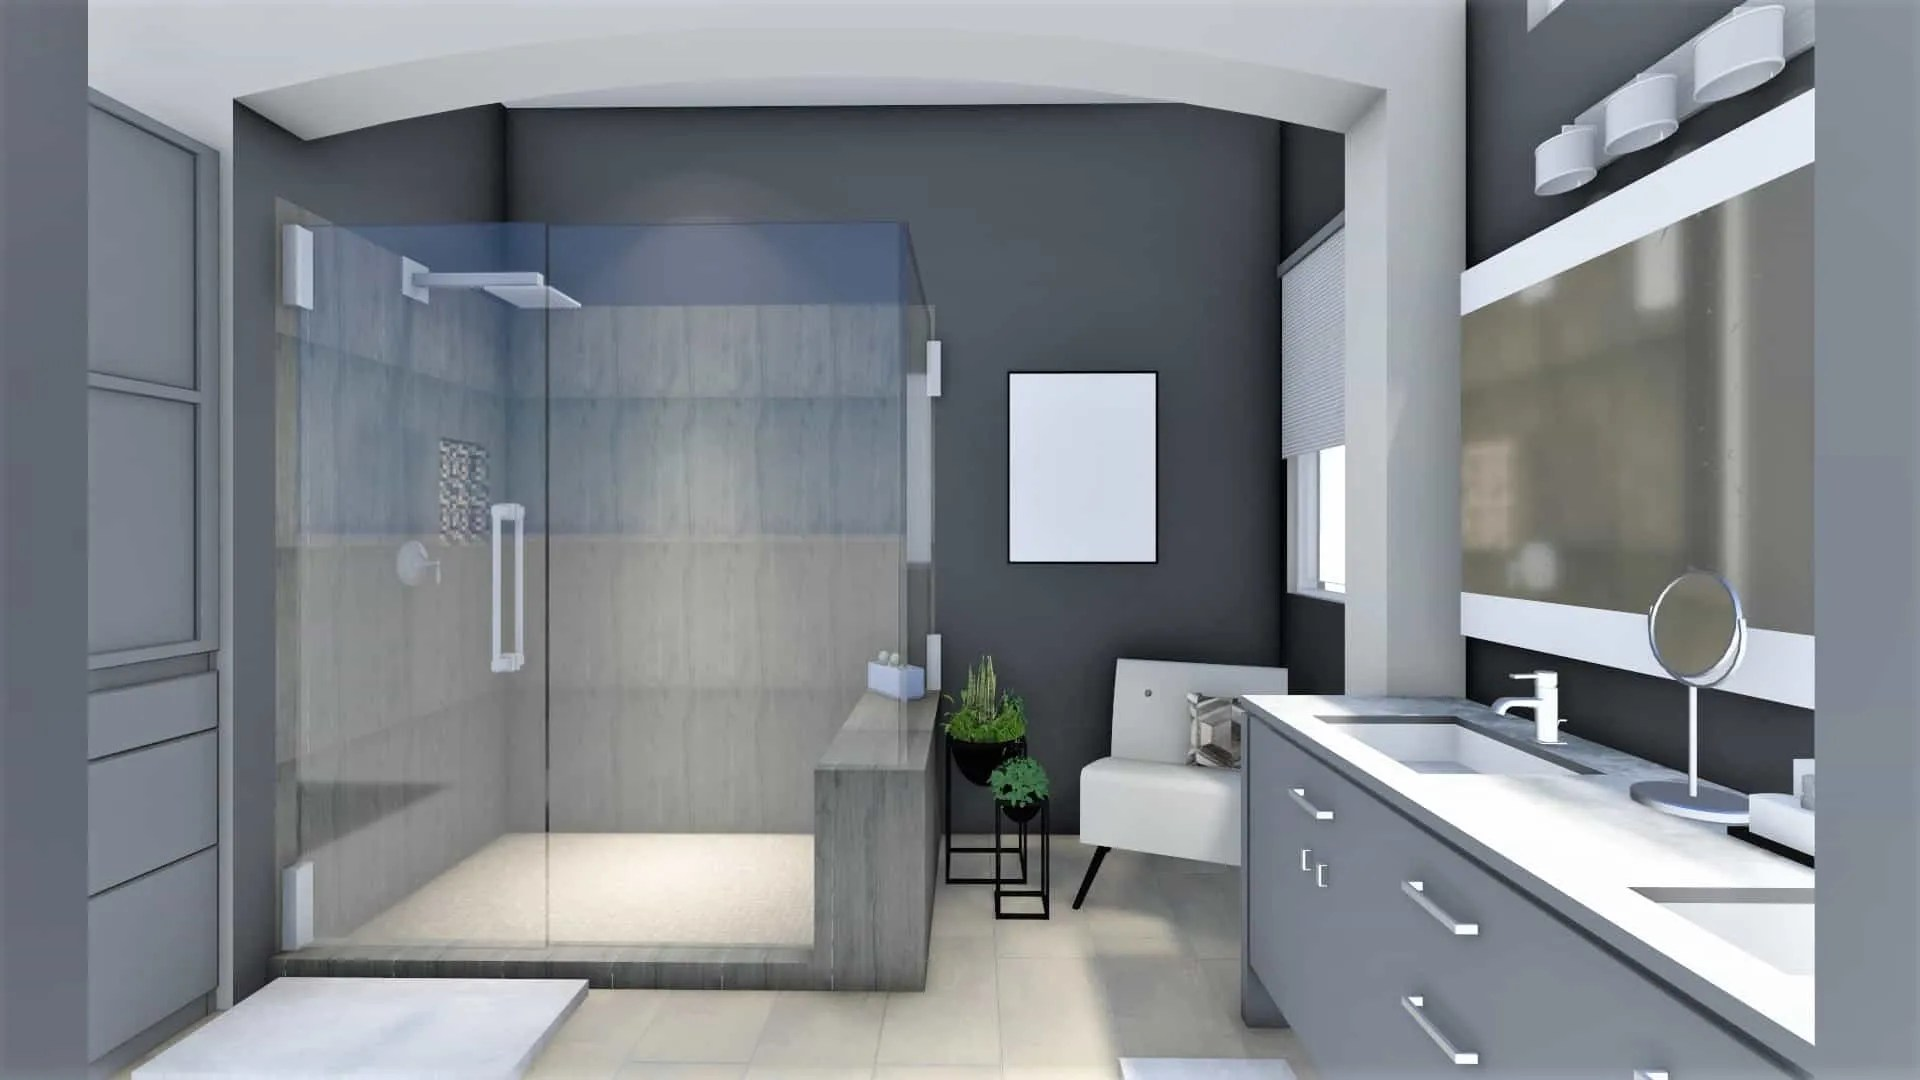 Best Kitchen Gallery: 3d Bathroom Design Gi Construction of 3d Bathroom Design  on rachelxblog.com